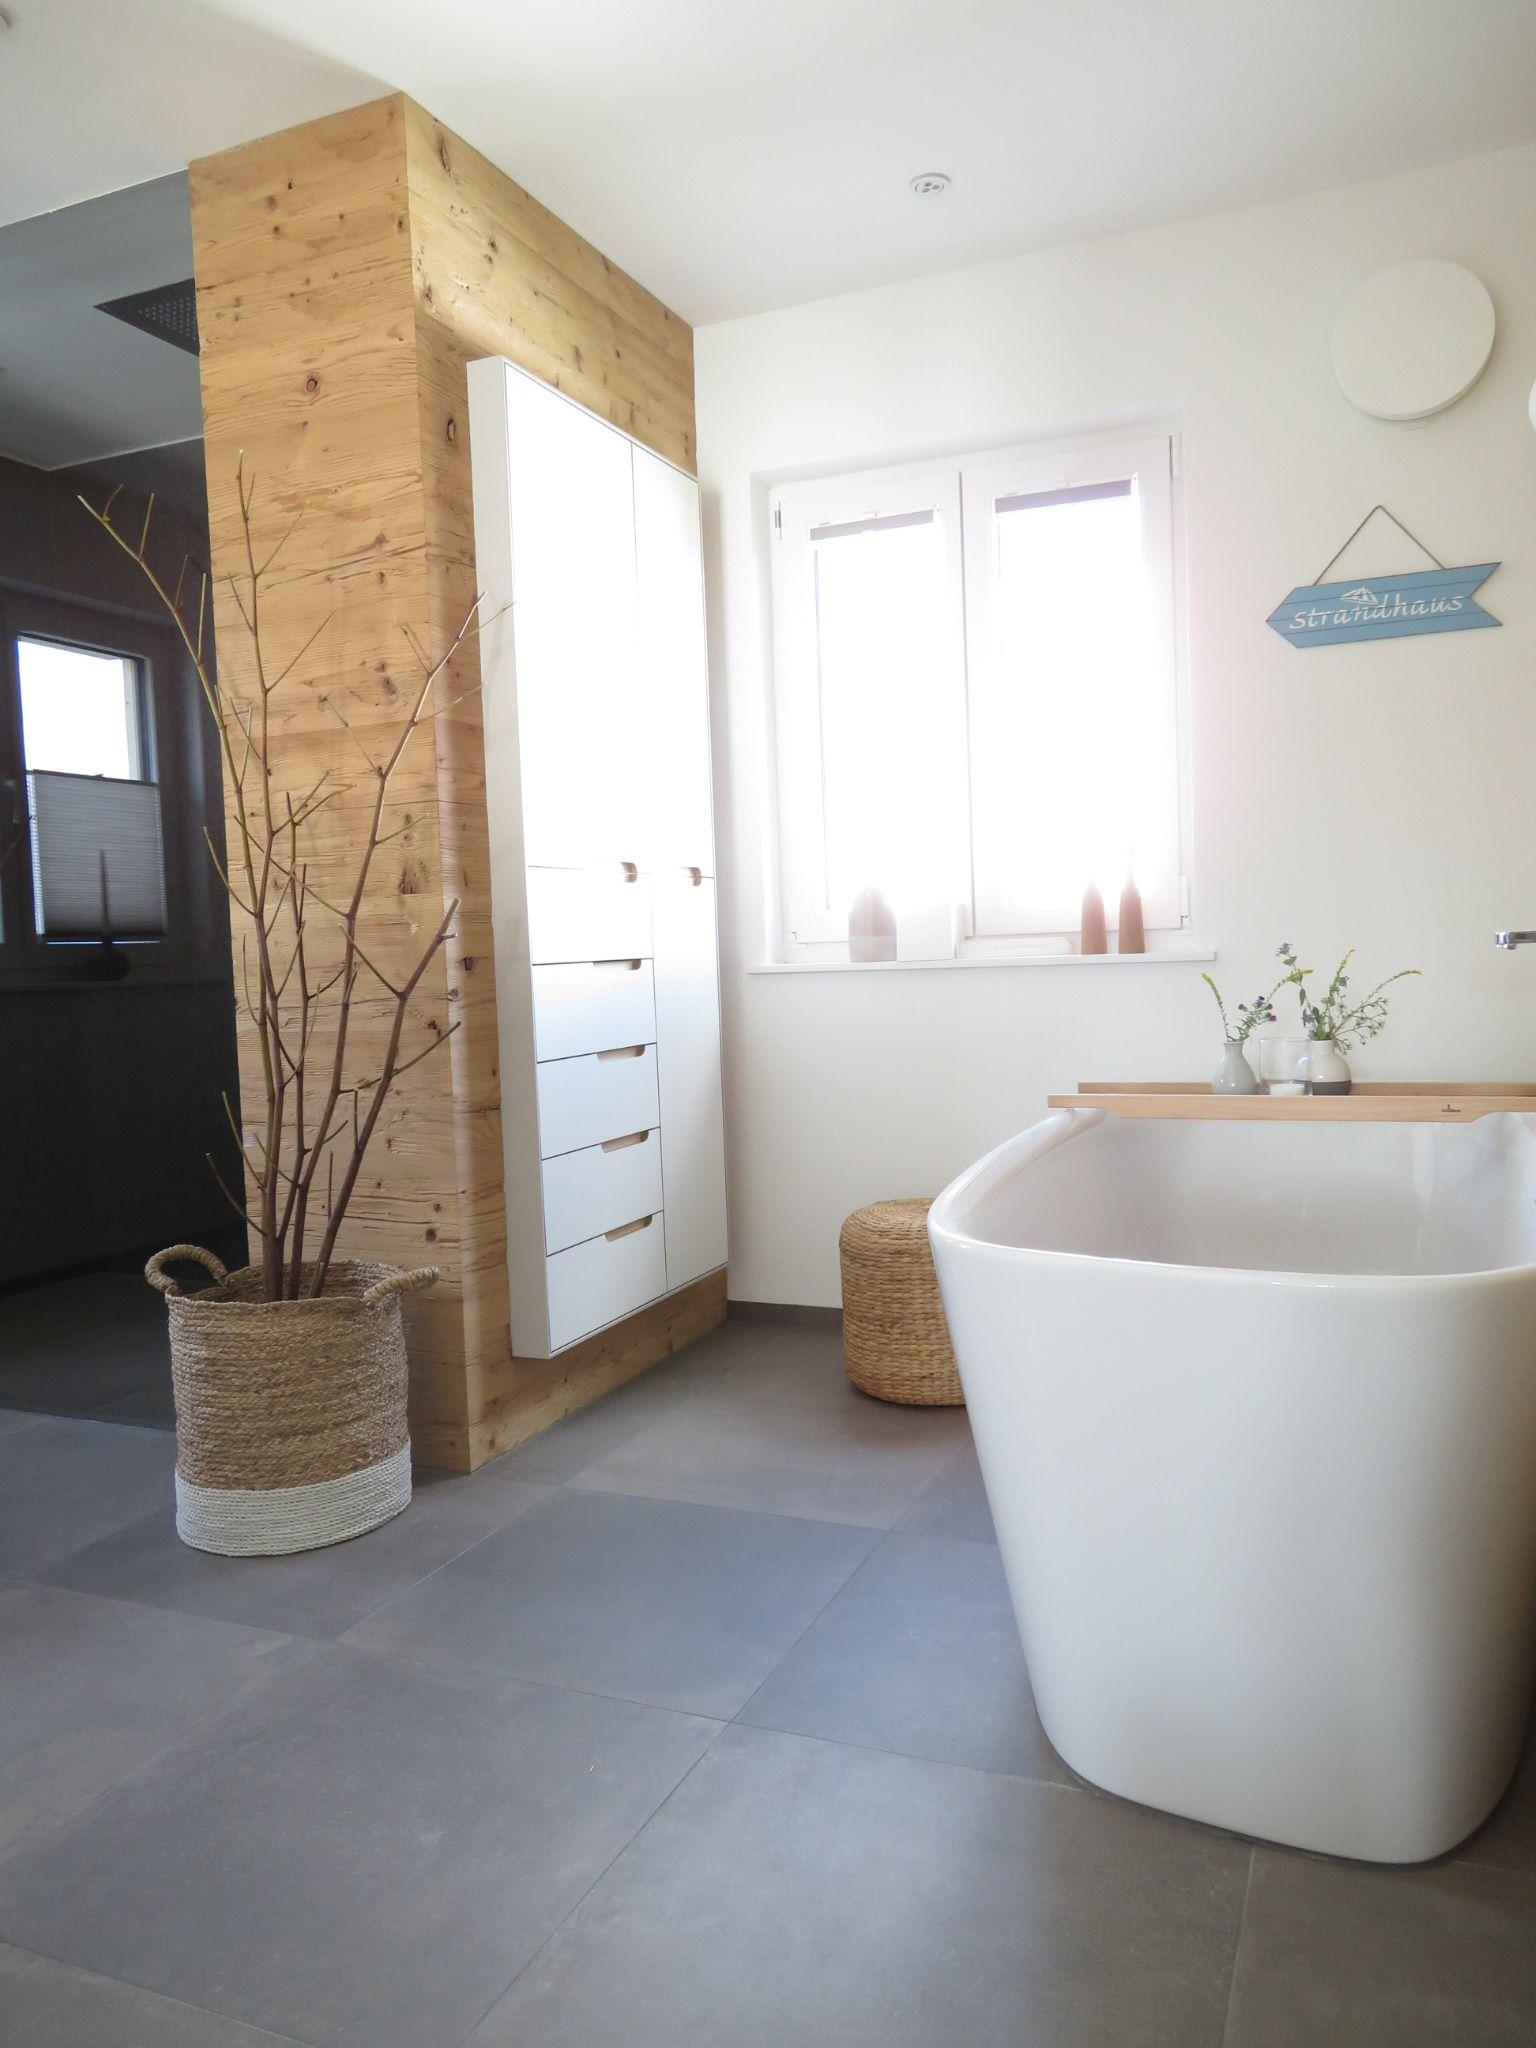 Badezimmer Betonoptik badezimmer altholzwand freistehende badewanne fliesen